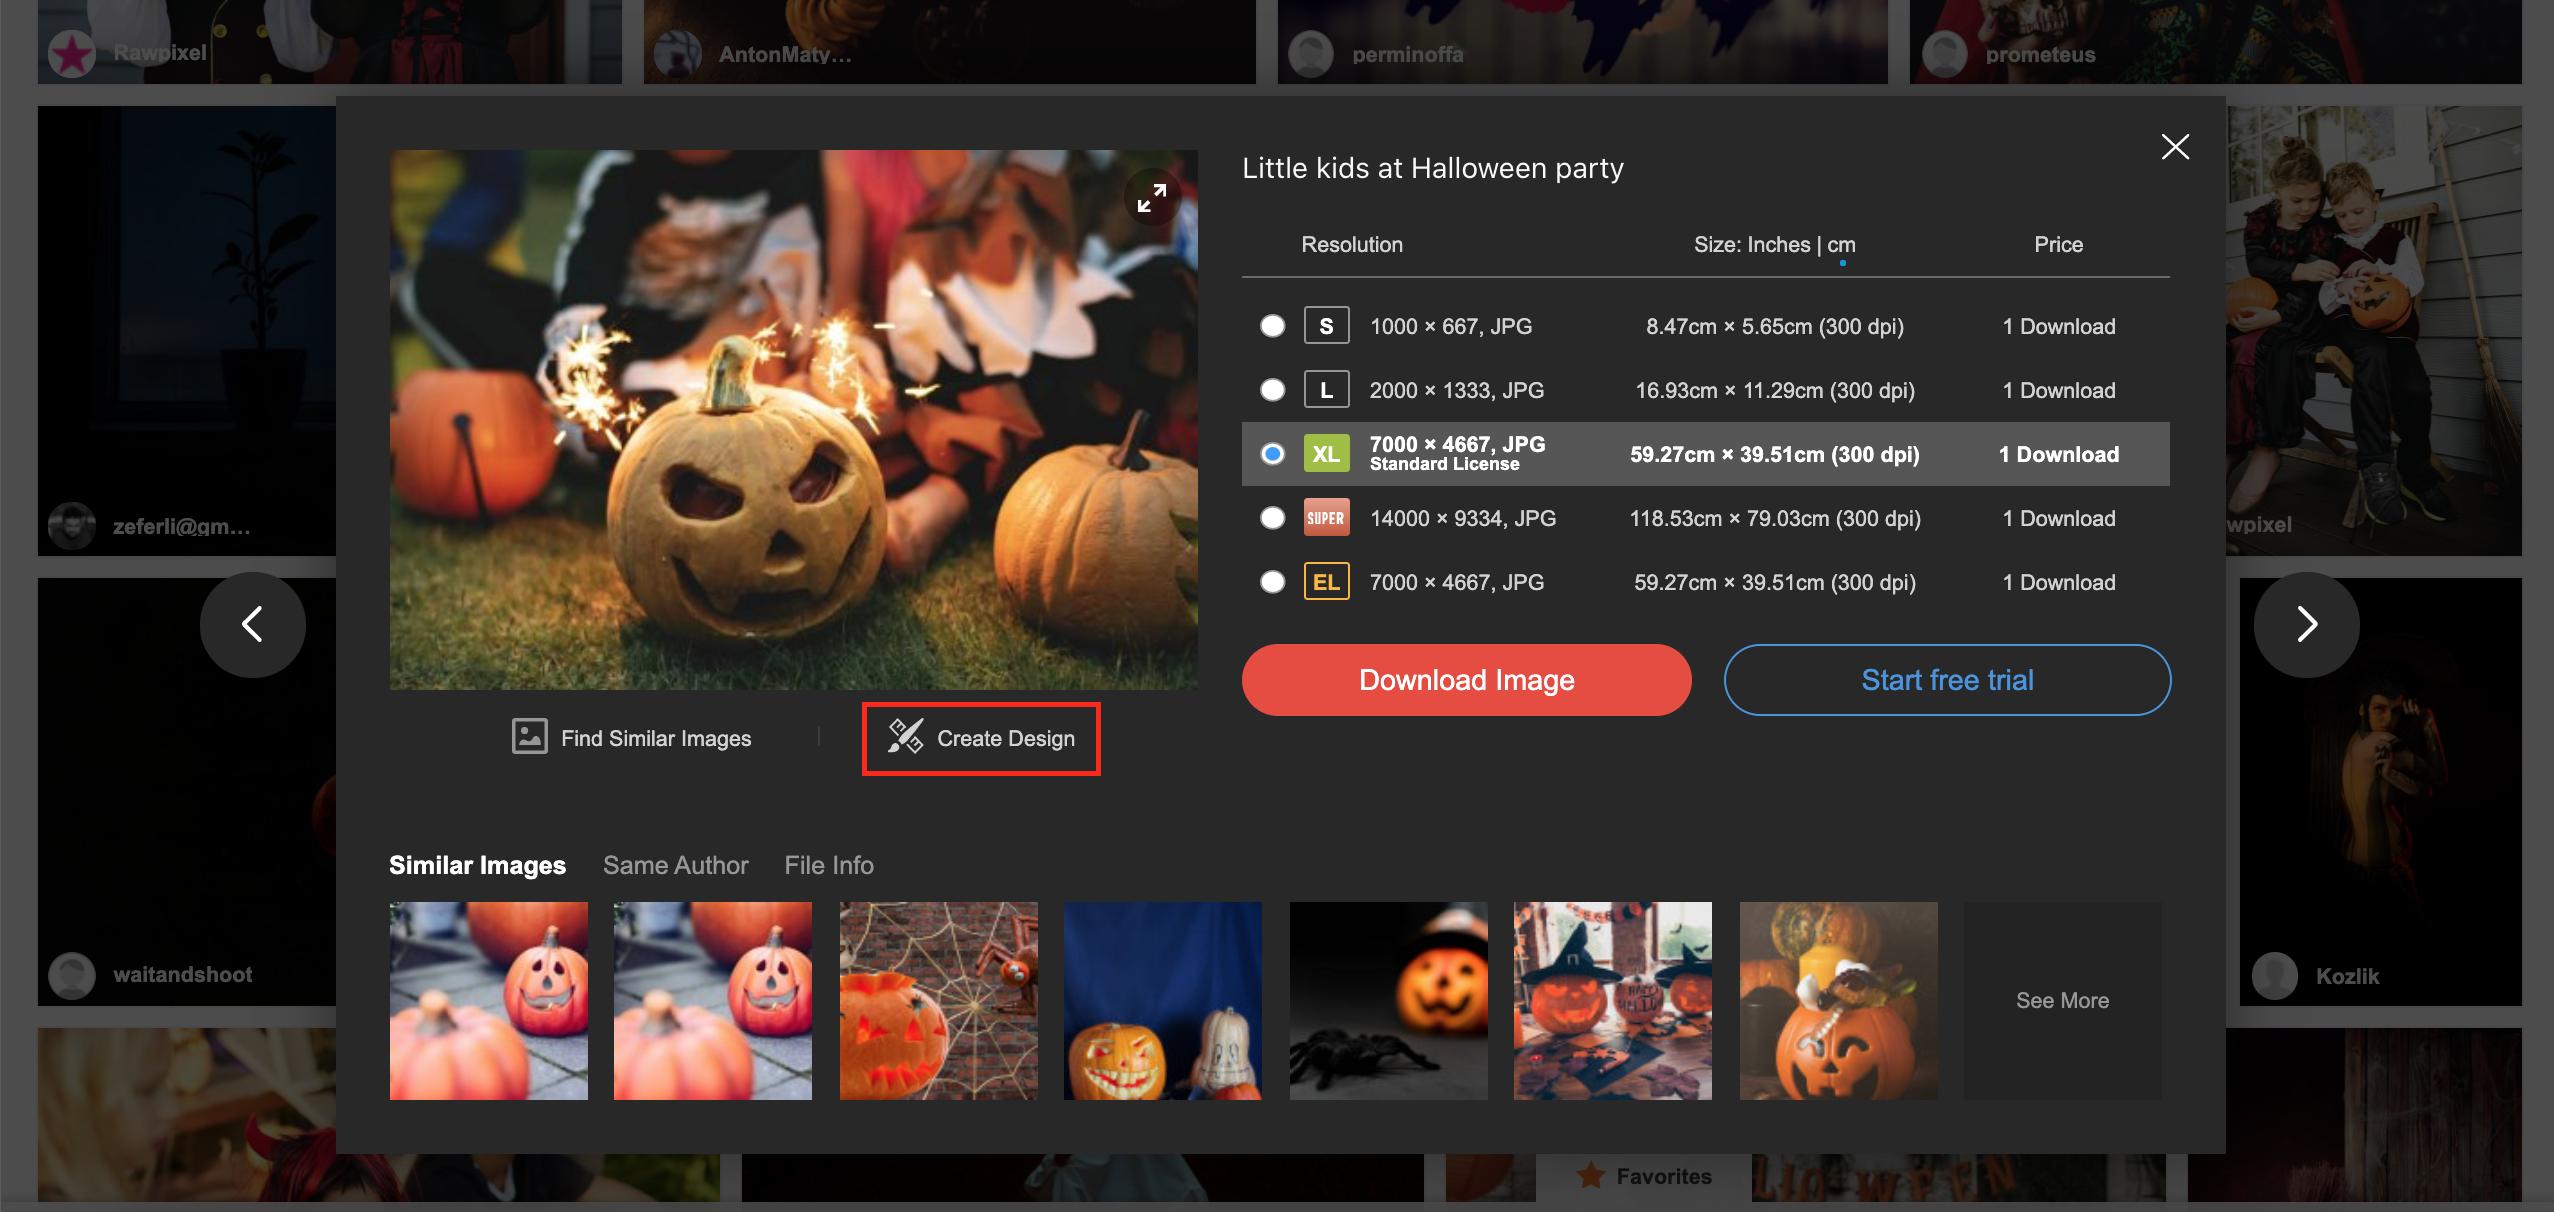 Discover free design templates on Depositphotos